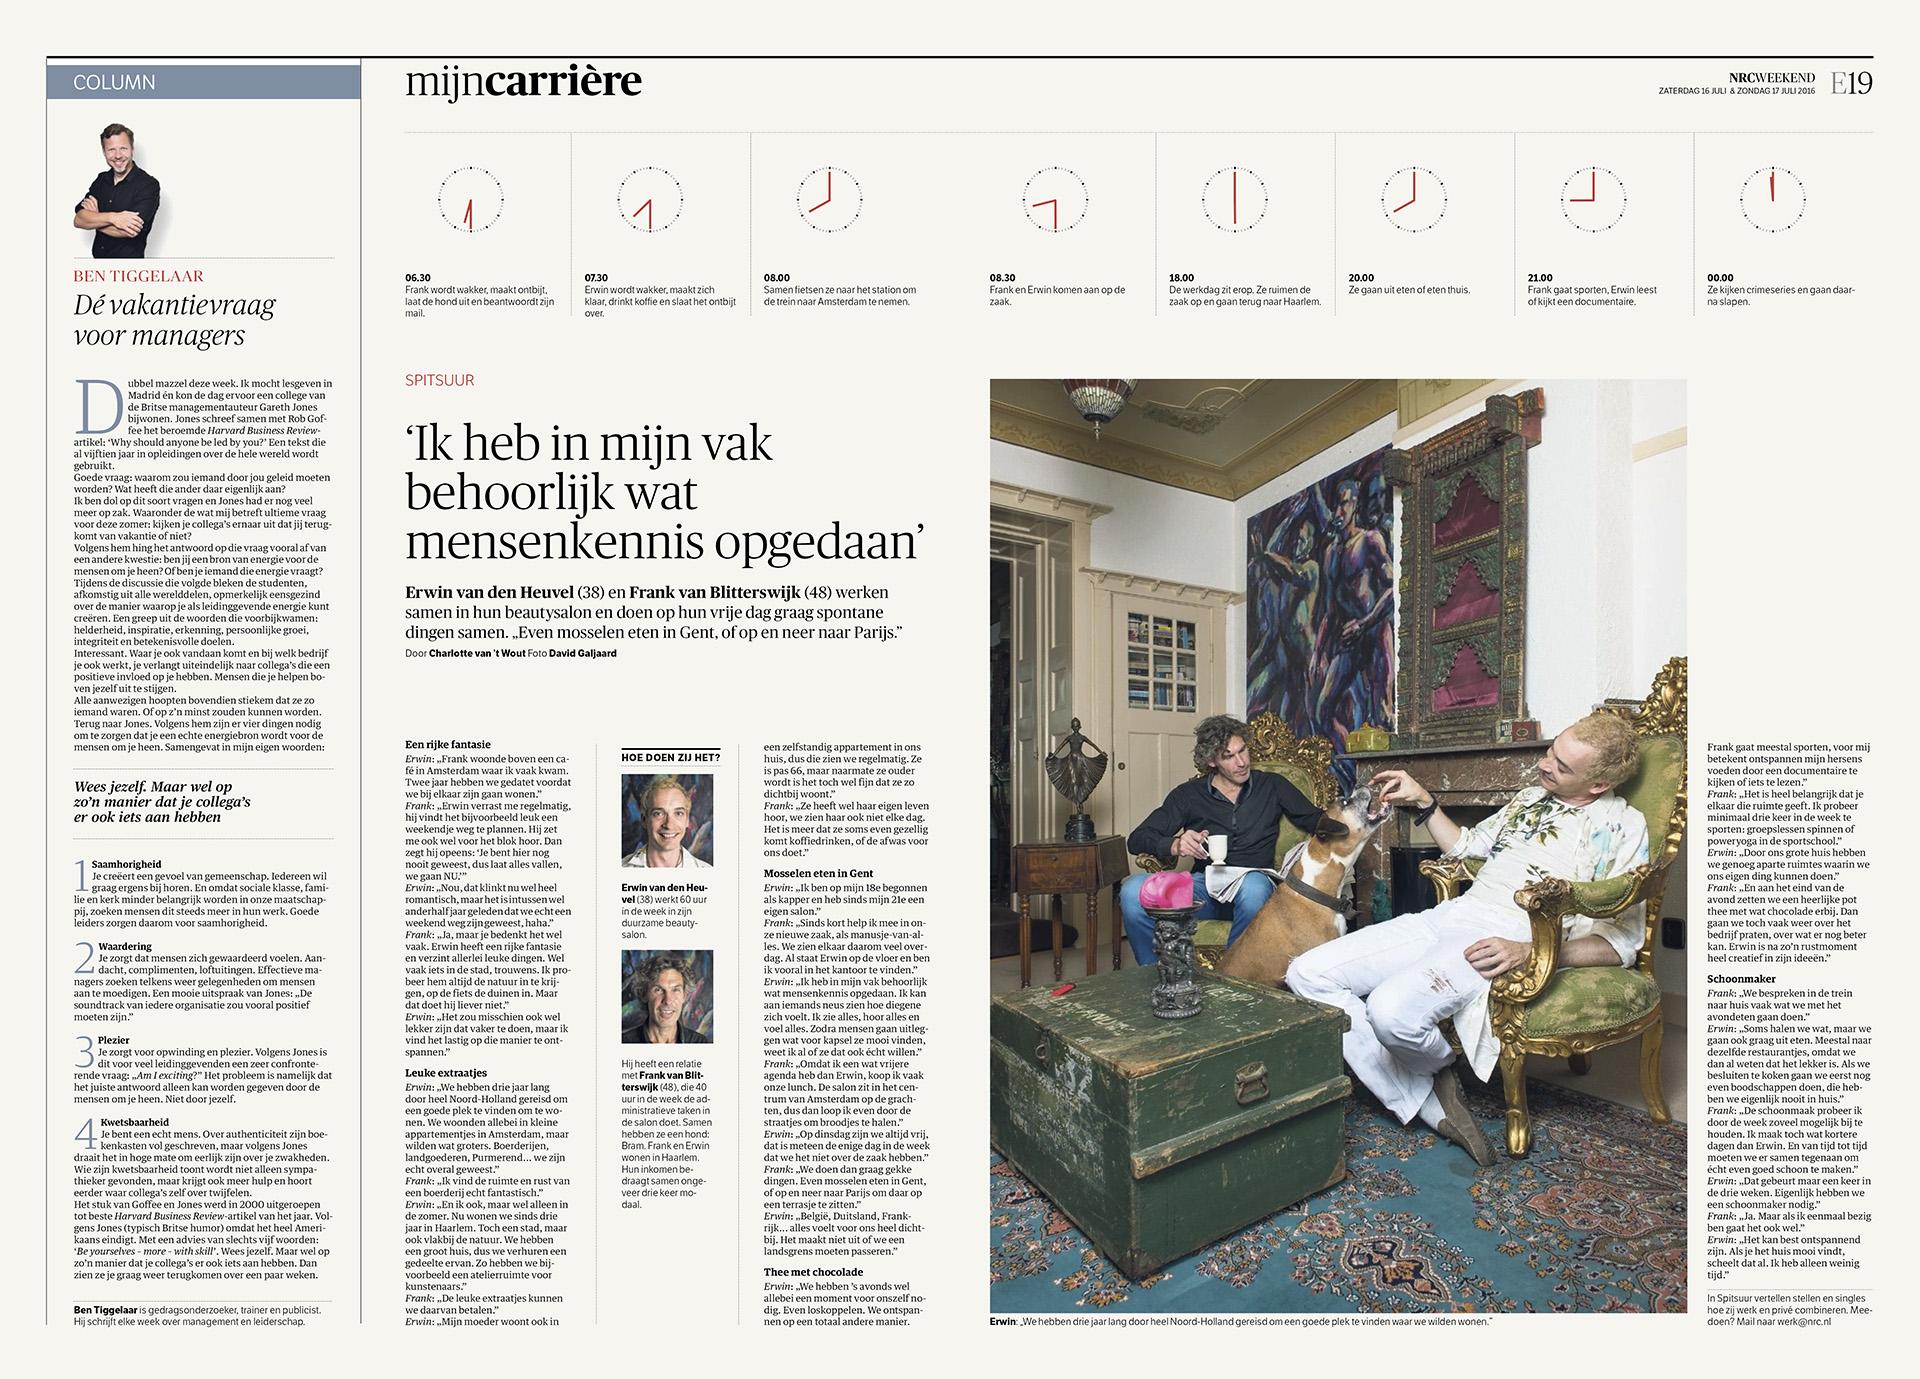 NRC Handelsblad - Economie - Spitsuur - 2016 - David Galjaard